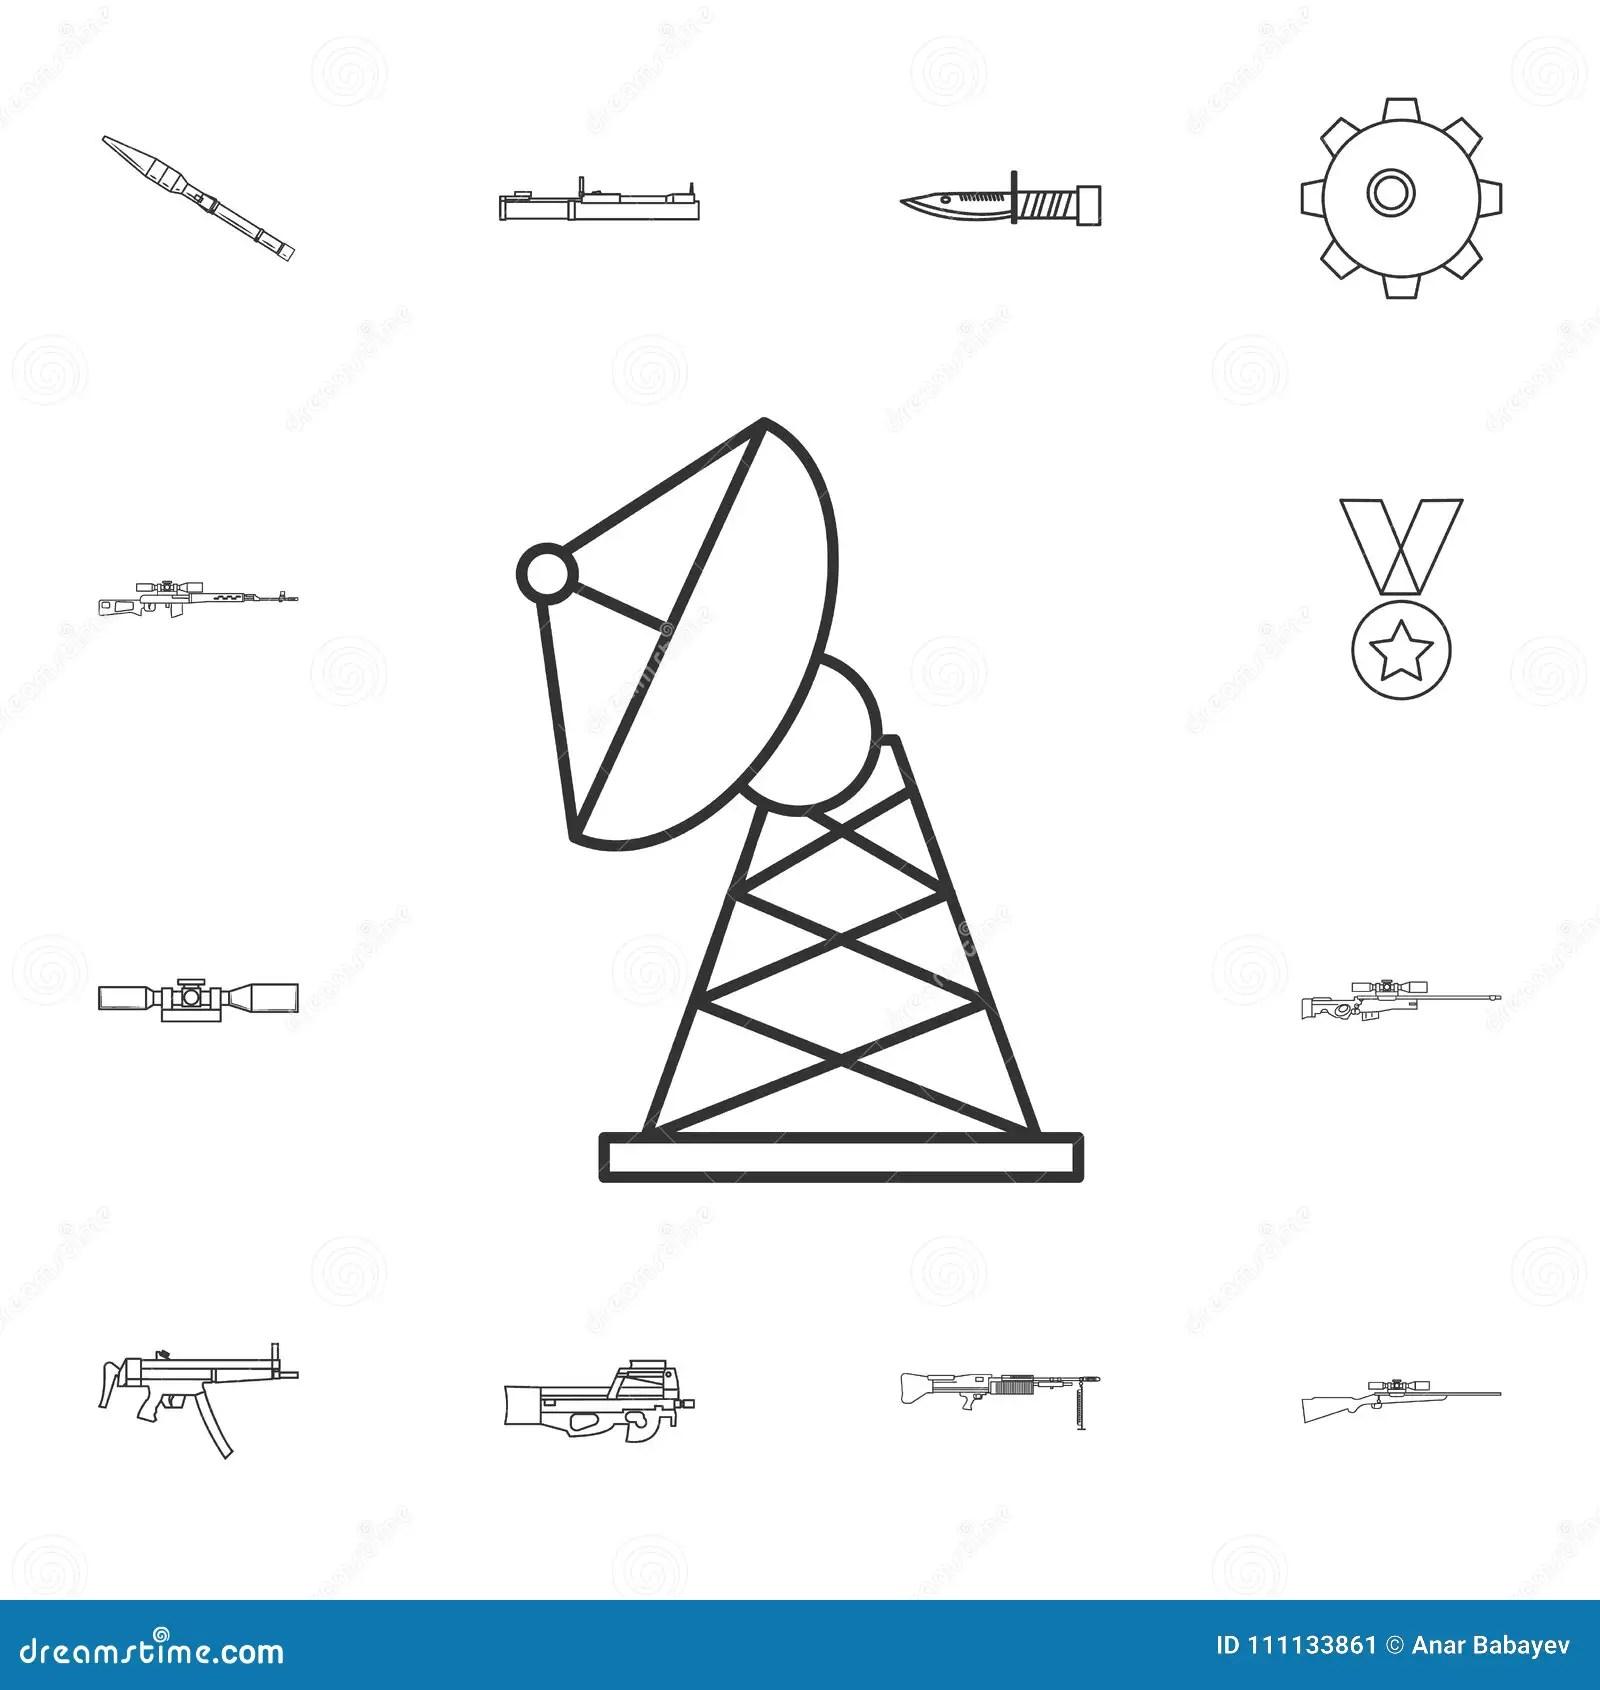 hight resolution of satellite dish line icon element of popular army icon premium quality graphic design